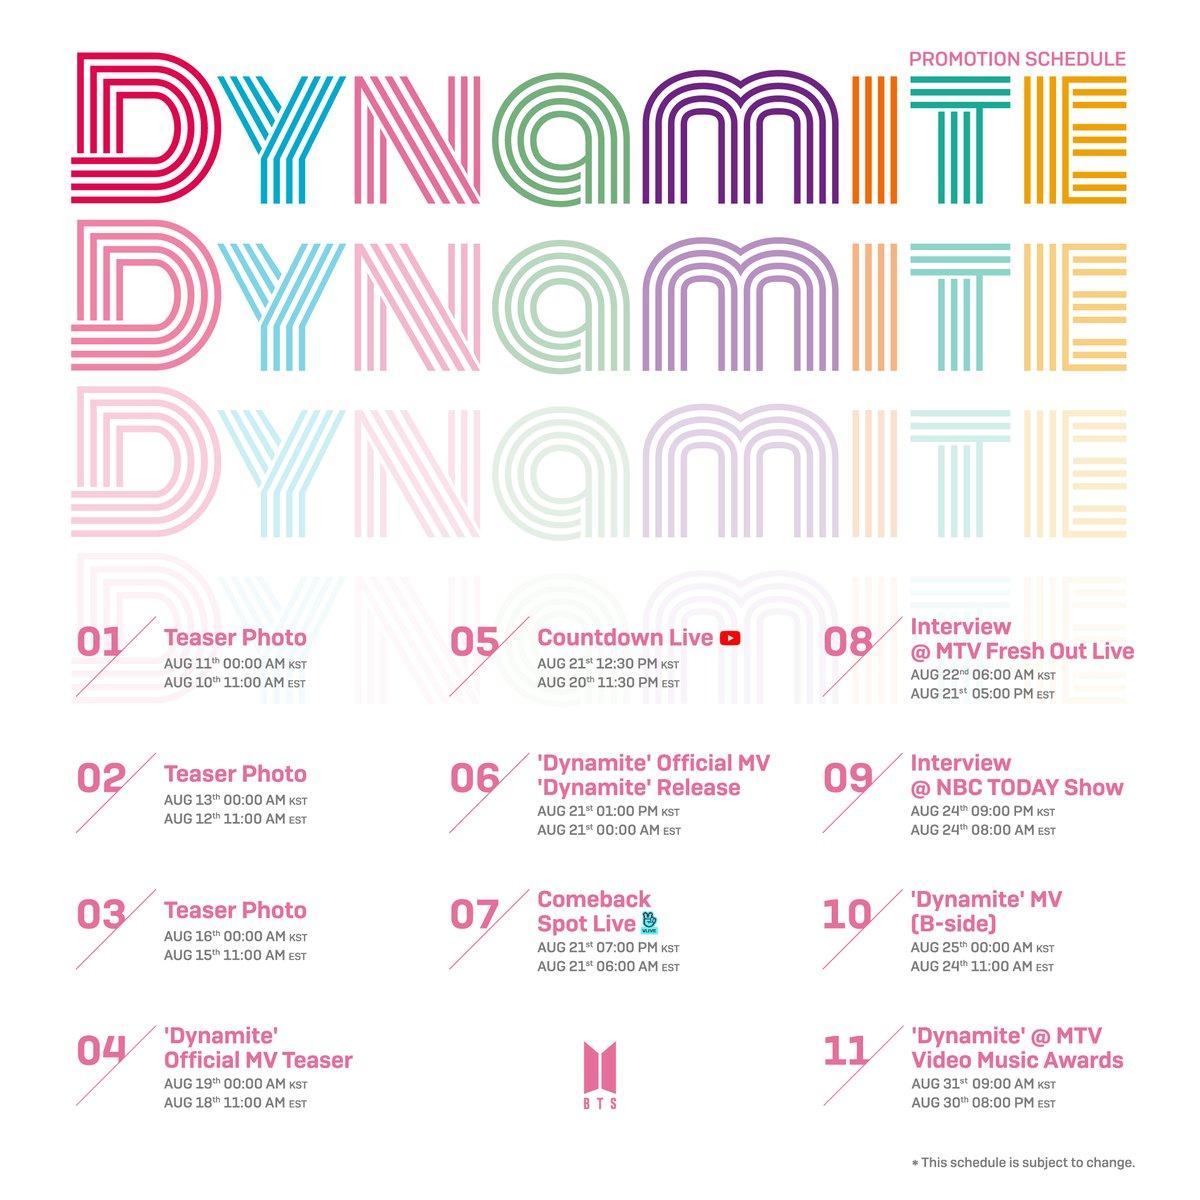 #BTS #방탄소년단 Dynamite Promotion Schedule  #BTS_Dynamite https://t.co/XhdUMnktwY